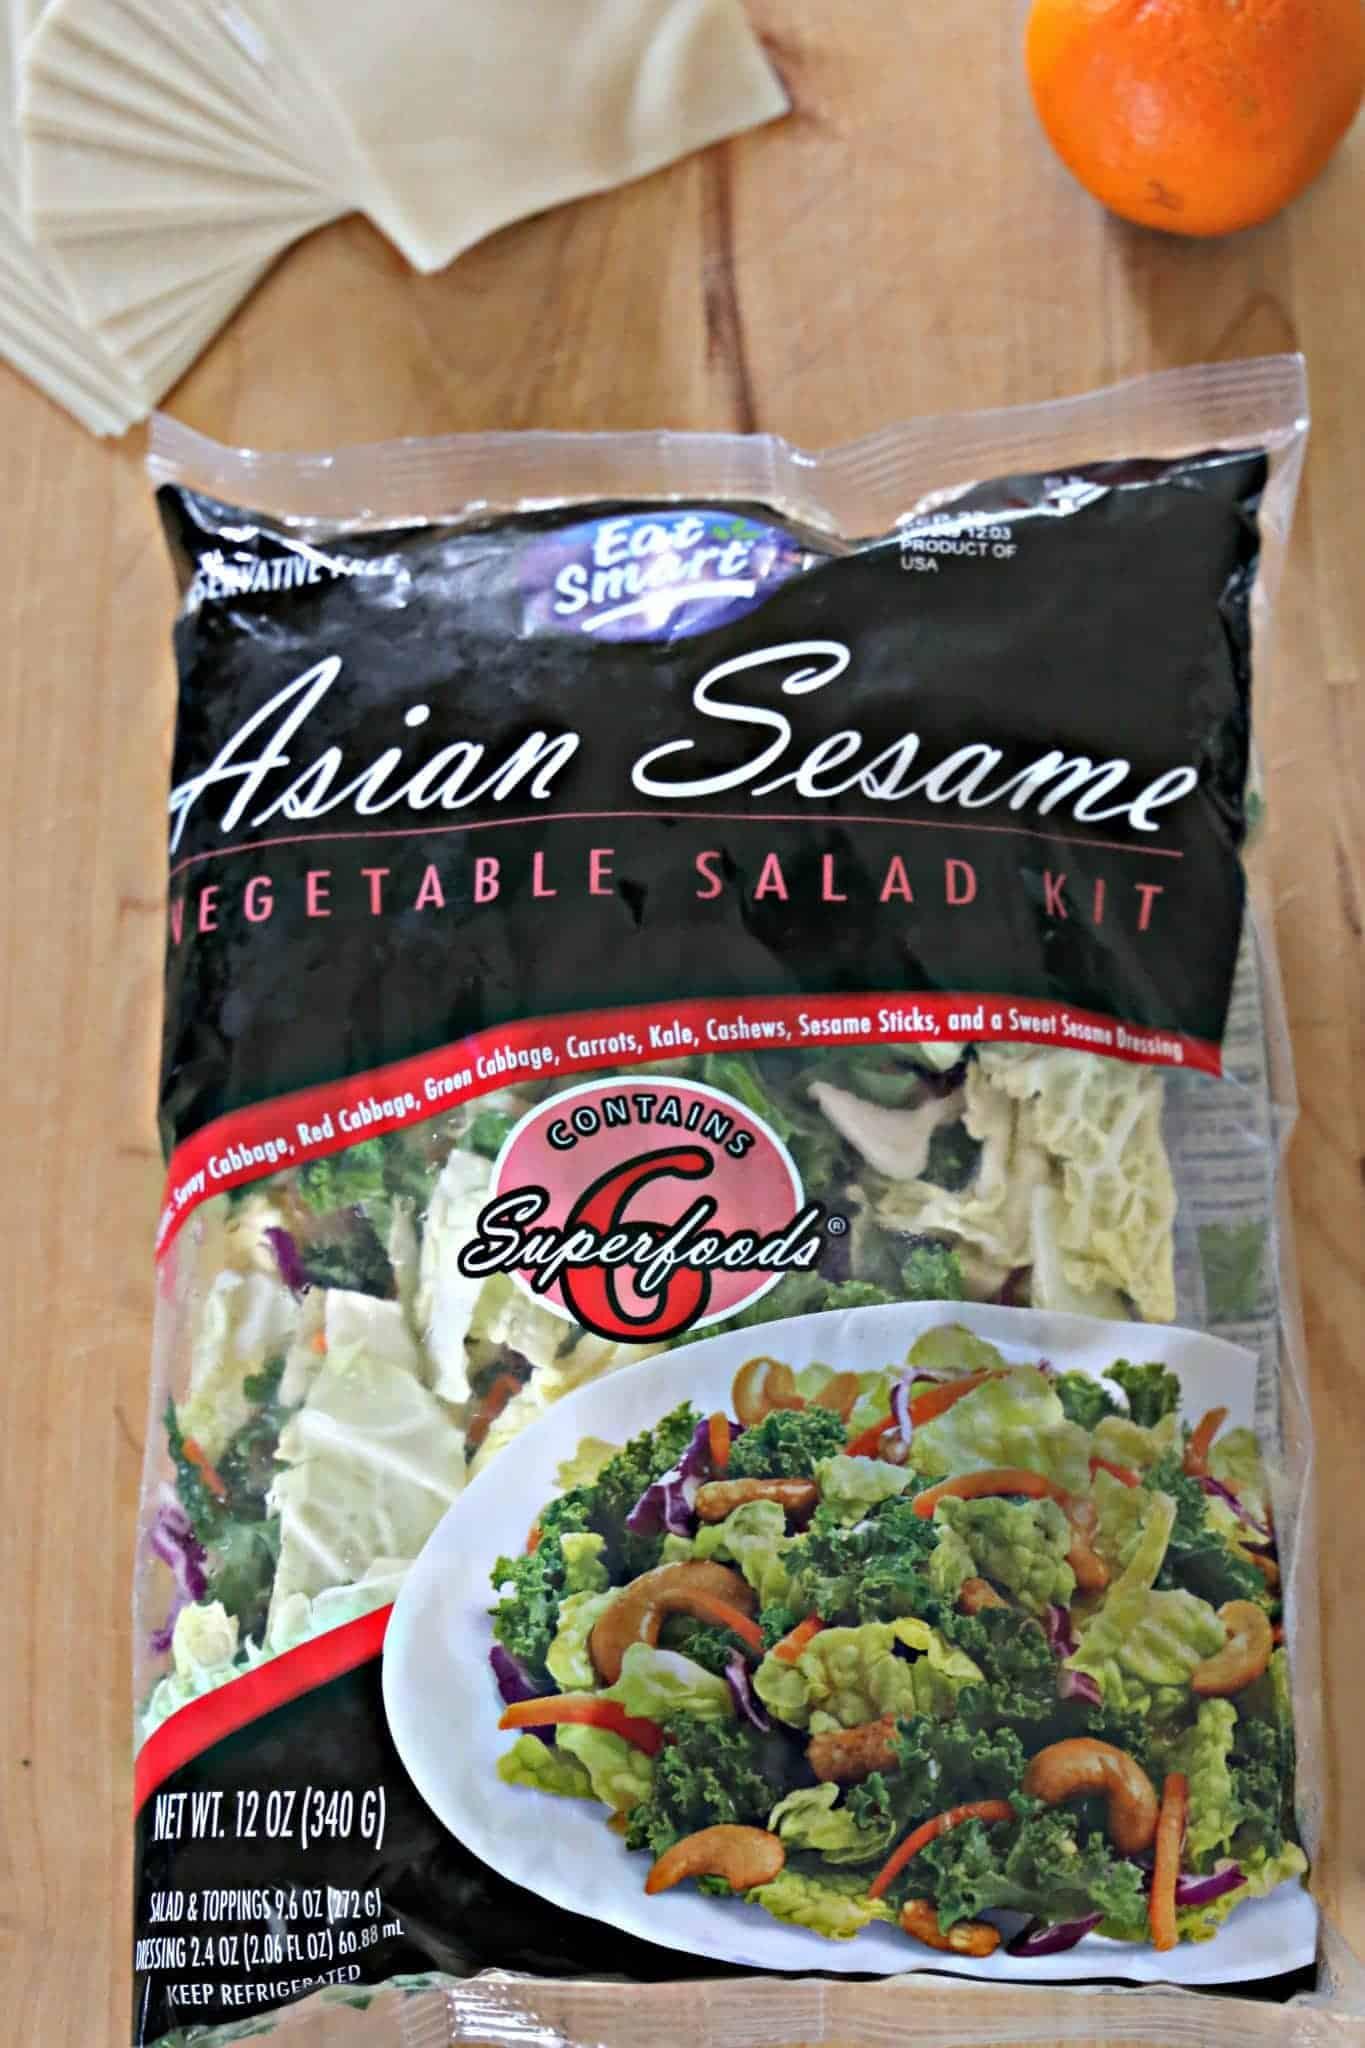 Eat Smart Gourmet Vegetable Salad kit